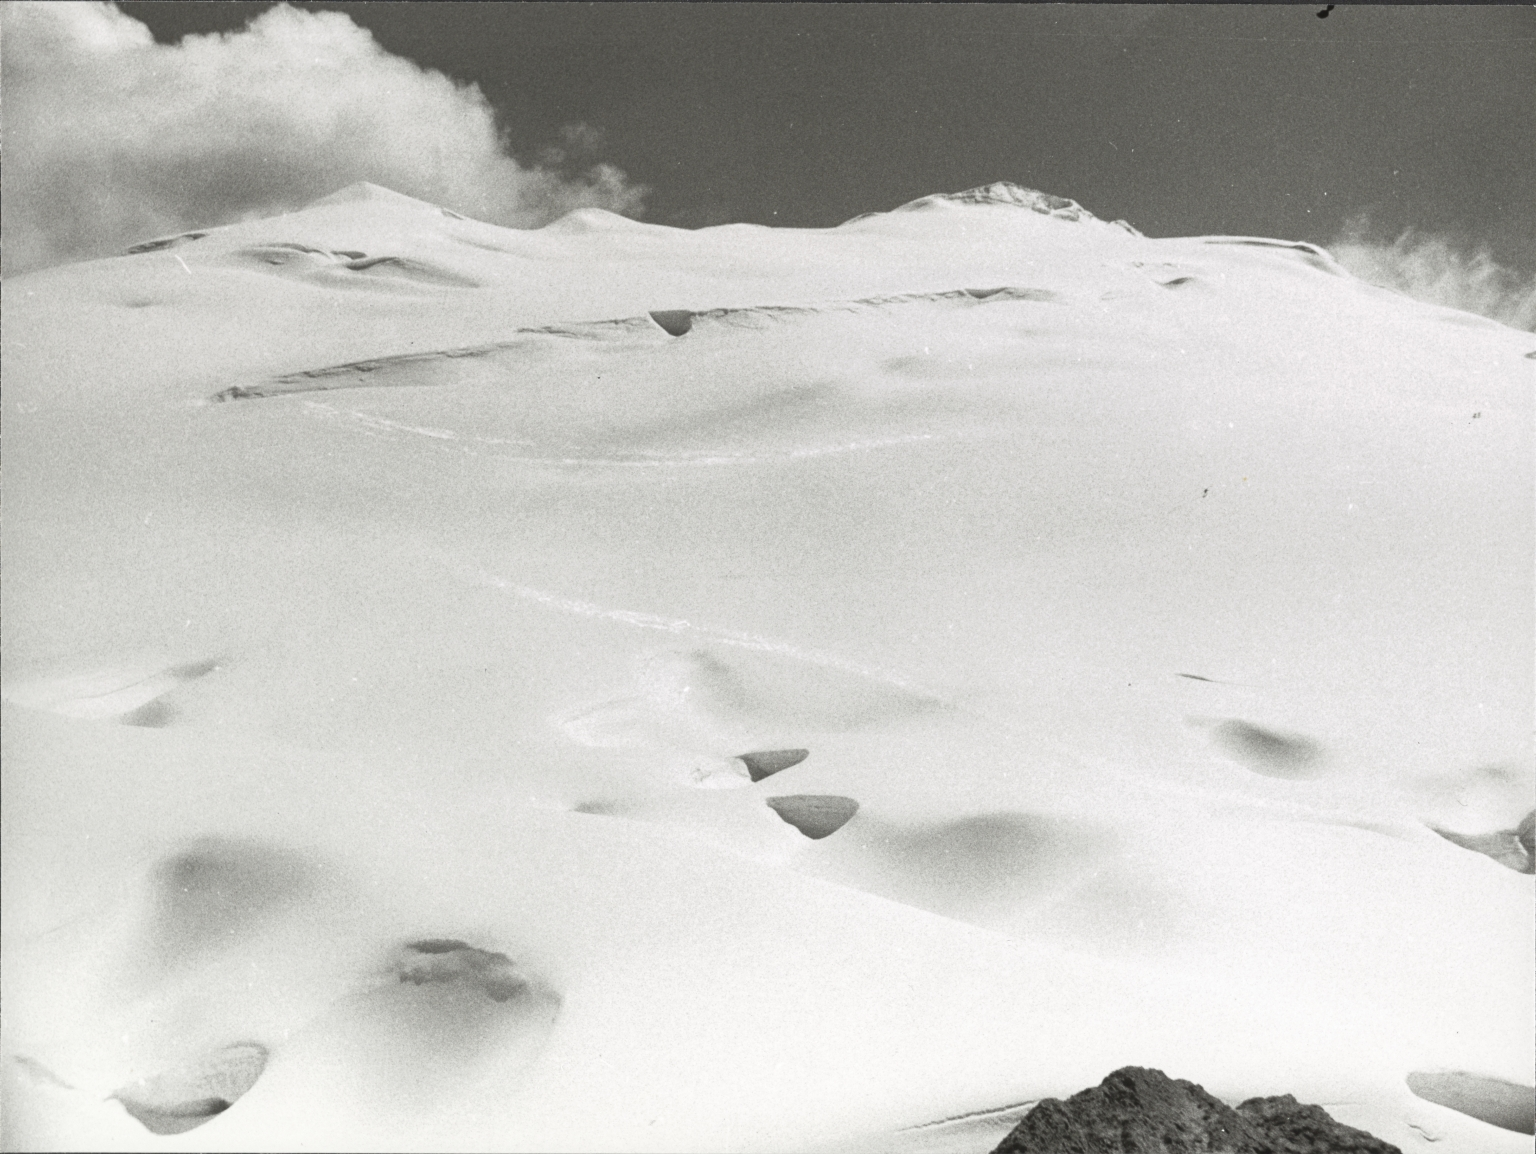 Carstensz Glacier accumulation zone, Indonesia